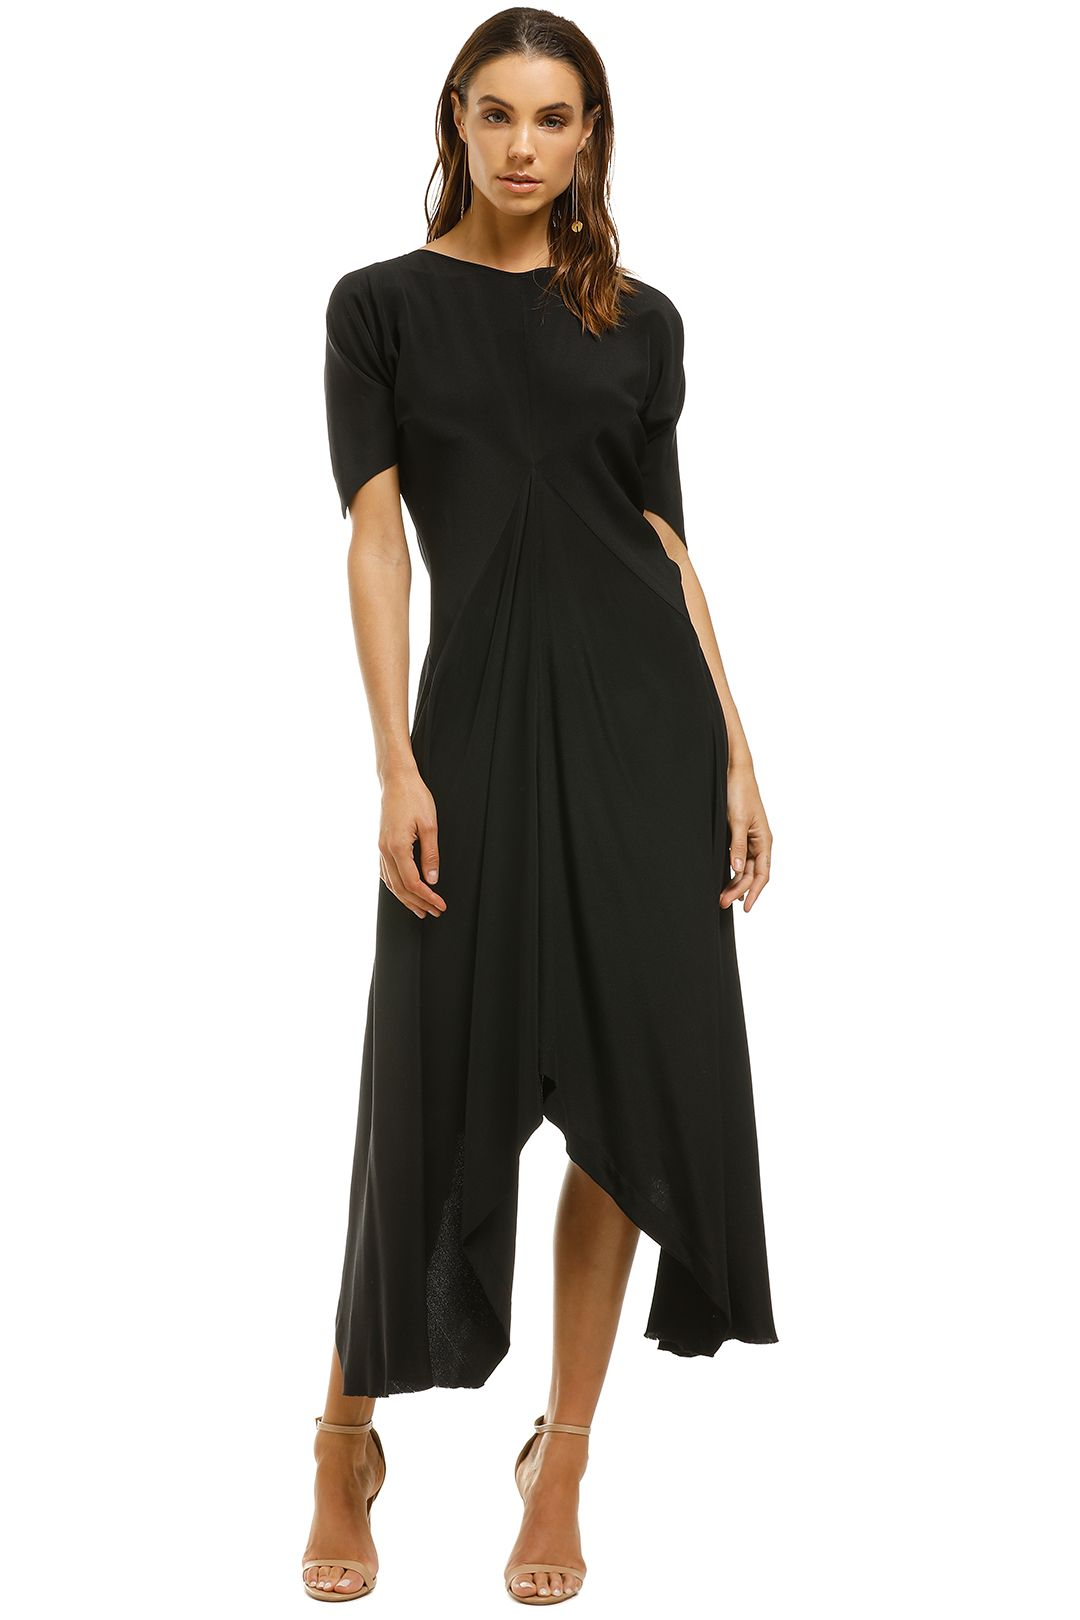 KITX - Solidarity Dress - Black - Front